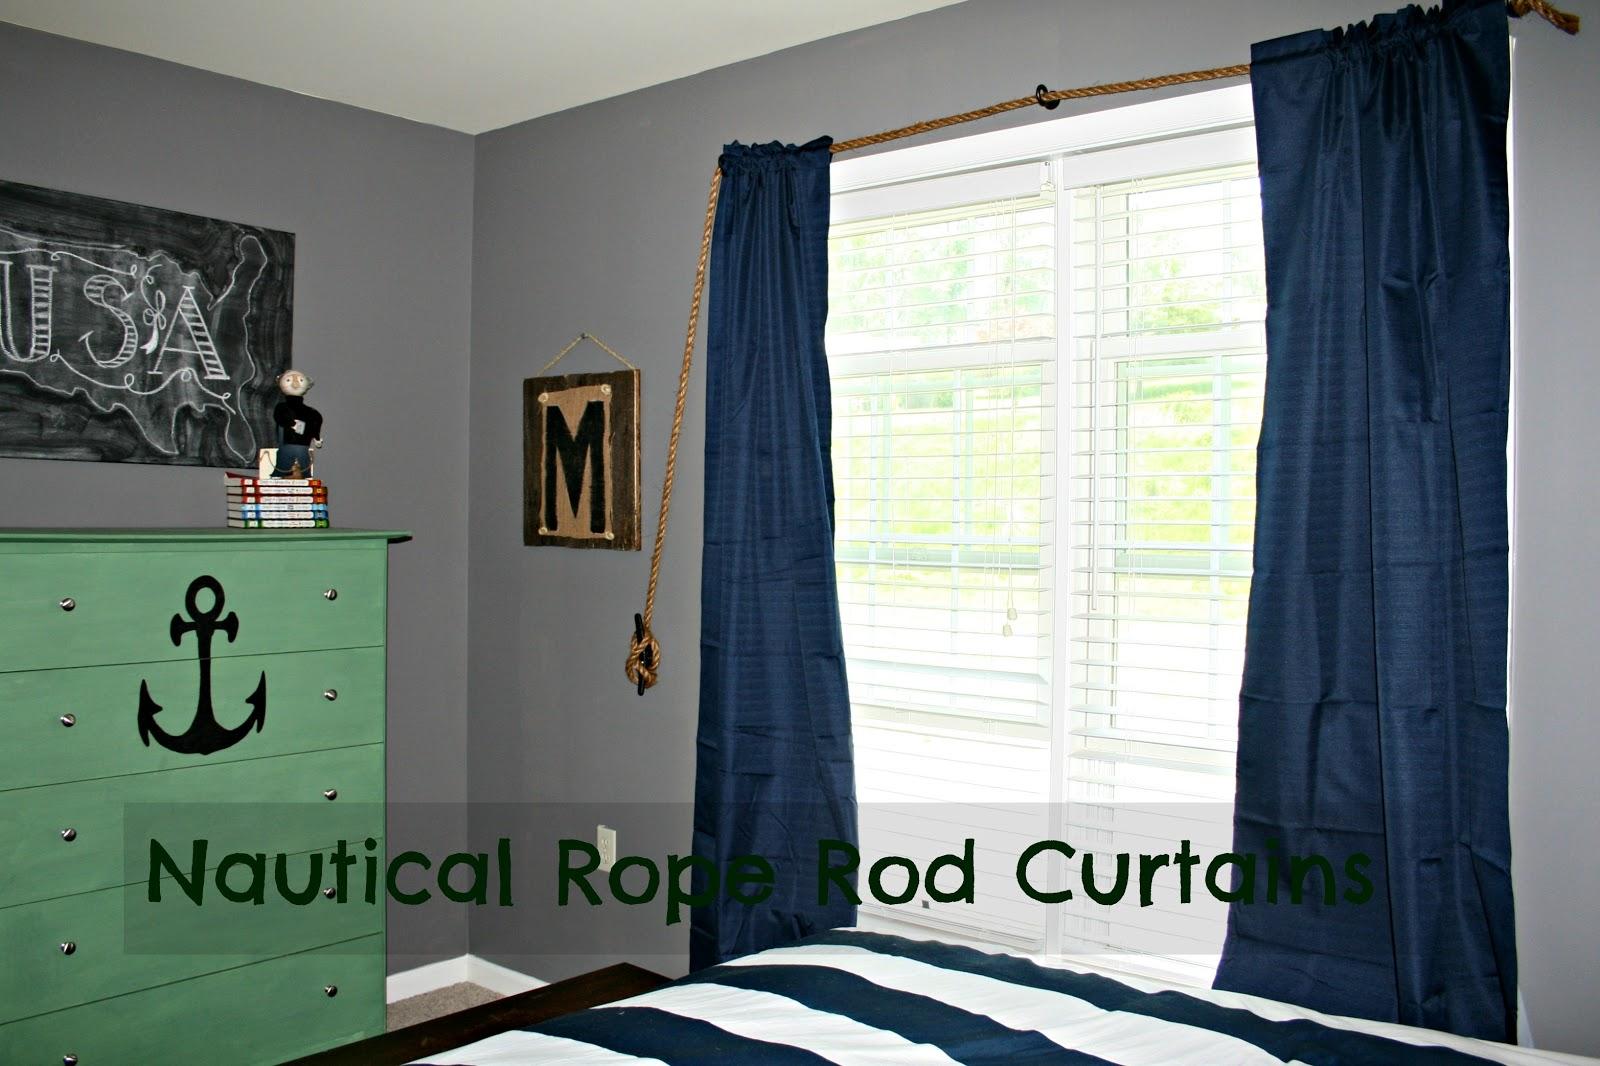 Nautical rope curtains - Curtain Rods Nautical Curtain Rods Nautical Rope Rod Curtains